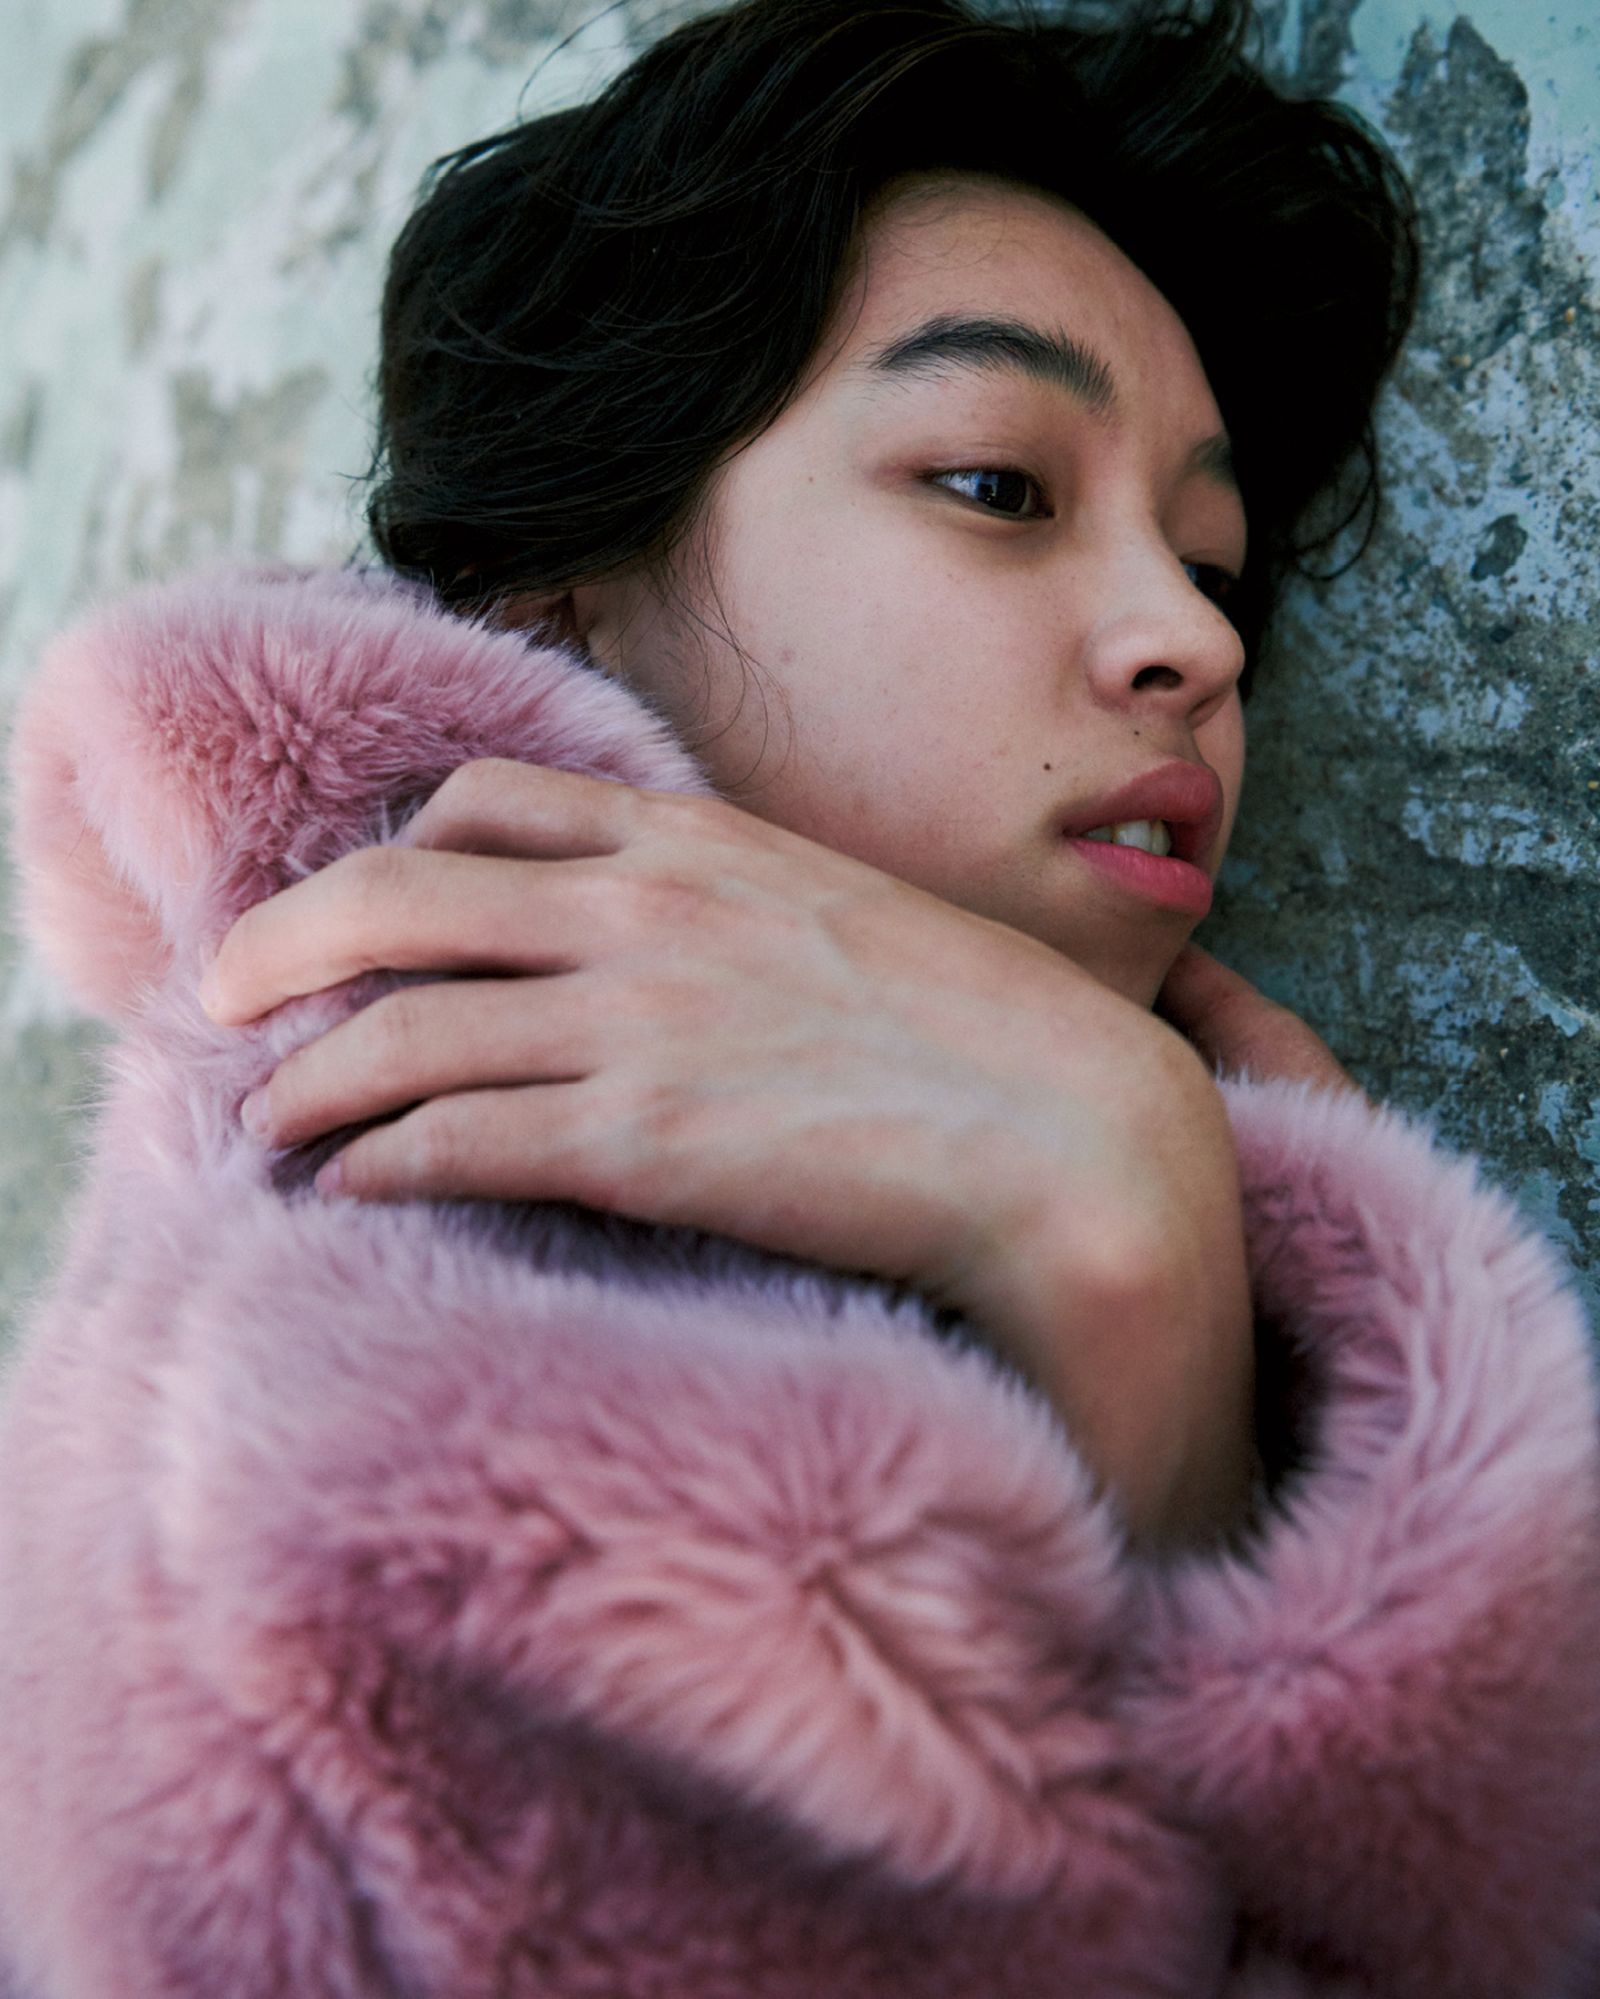 yoshi-interview-01